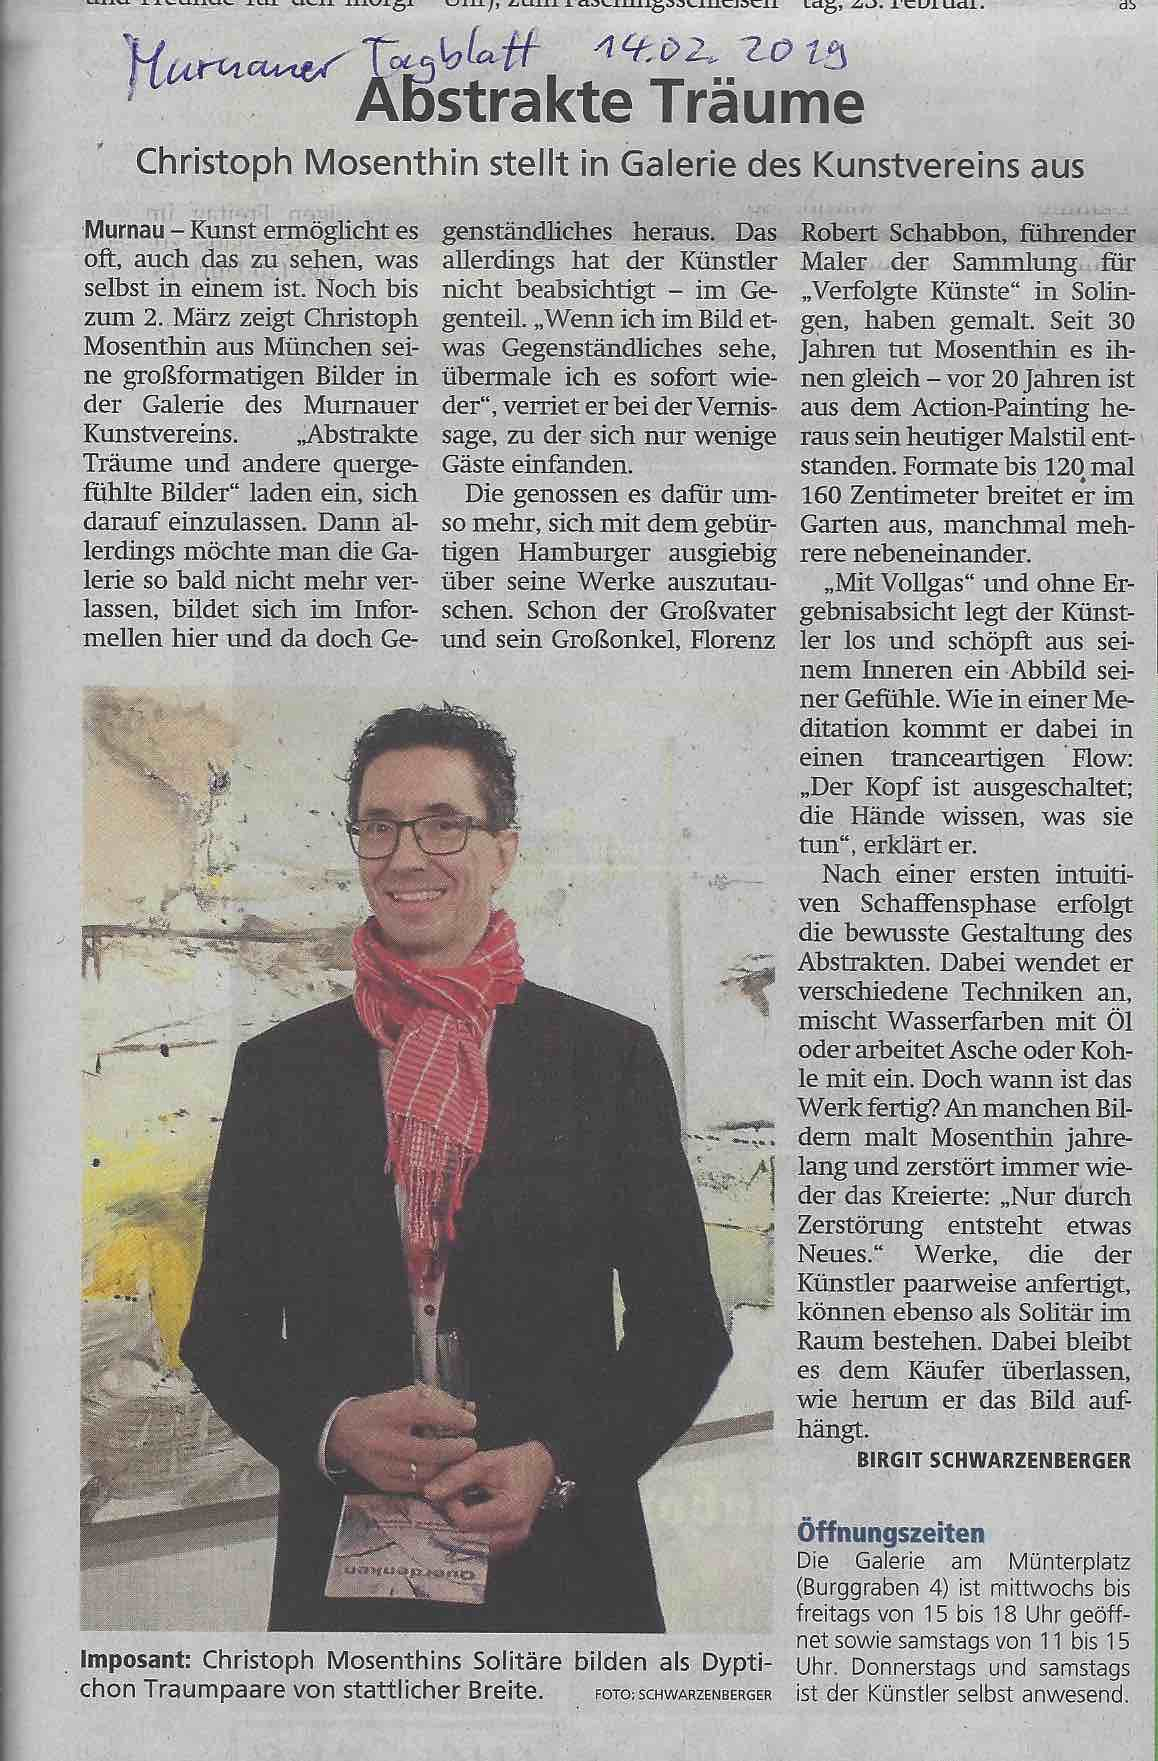 2019_02_Murnauer Tagblatt